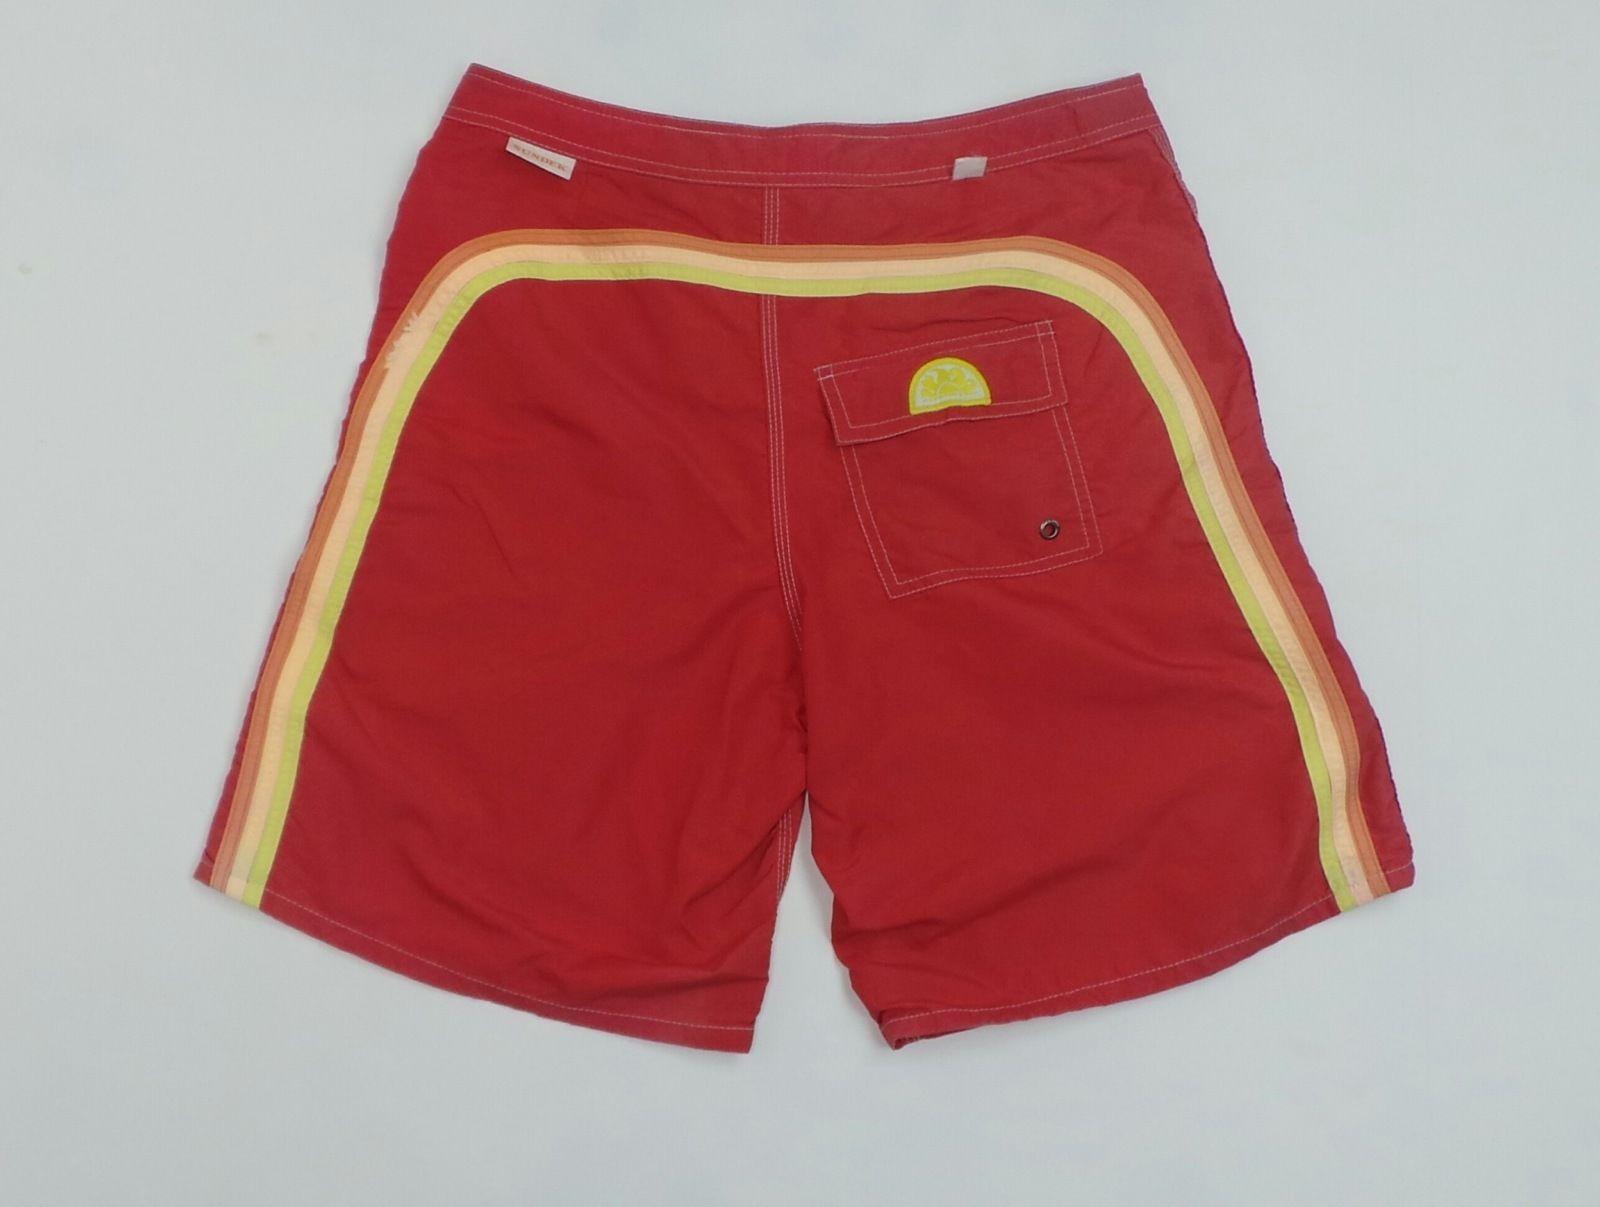 YINGWANG Pride Rainbow Flag Man Hiker Beach Swim Shorts Board Shorts